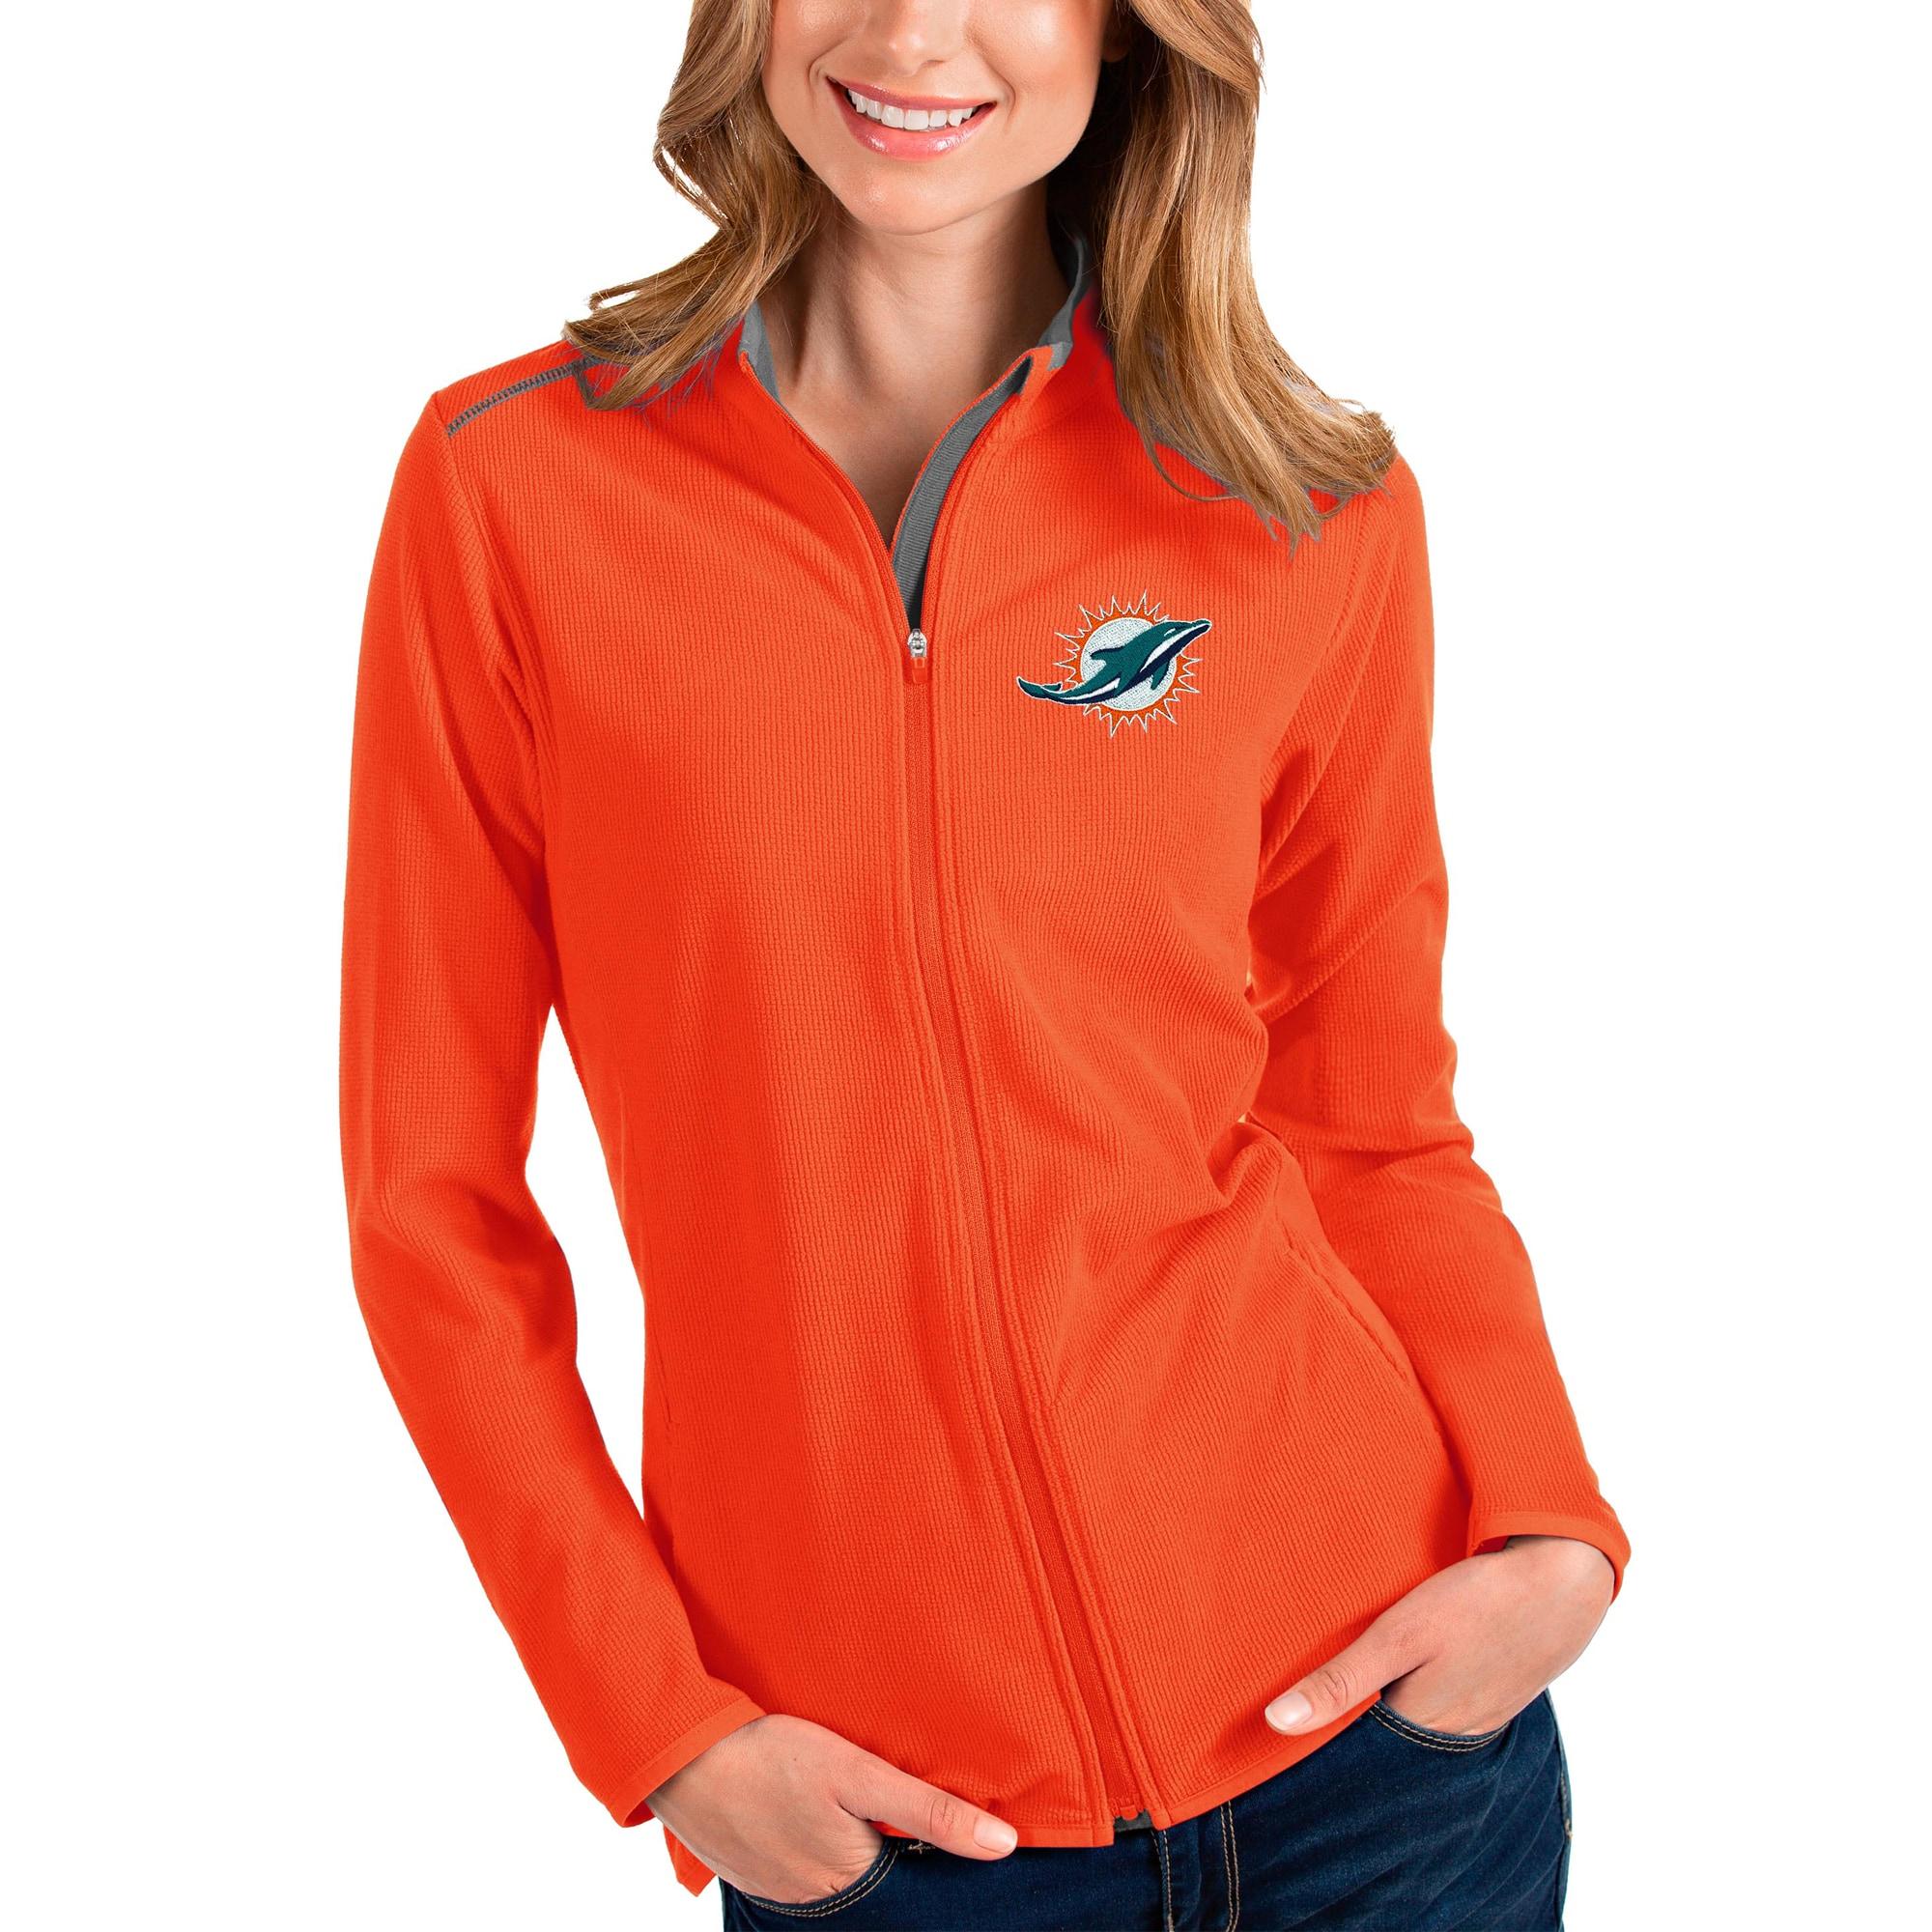 Miami Dolphins Antigua Women's Glacier Full-Zip Jacket - Orange